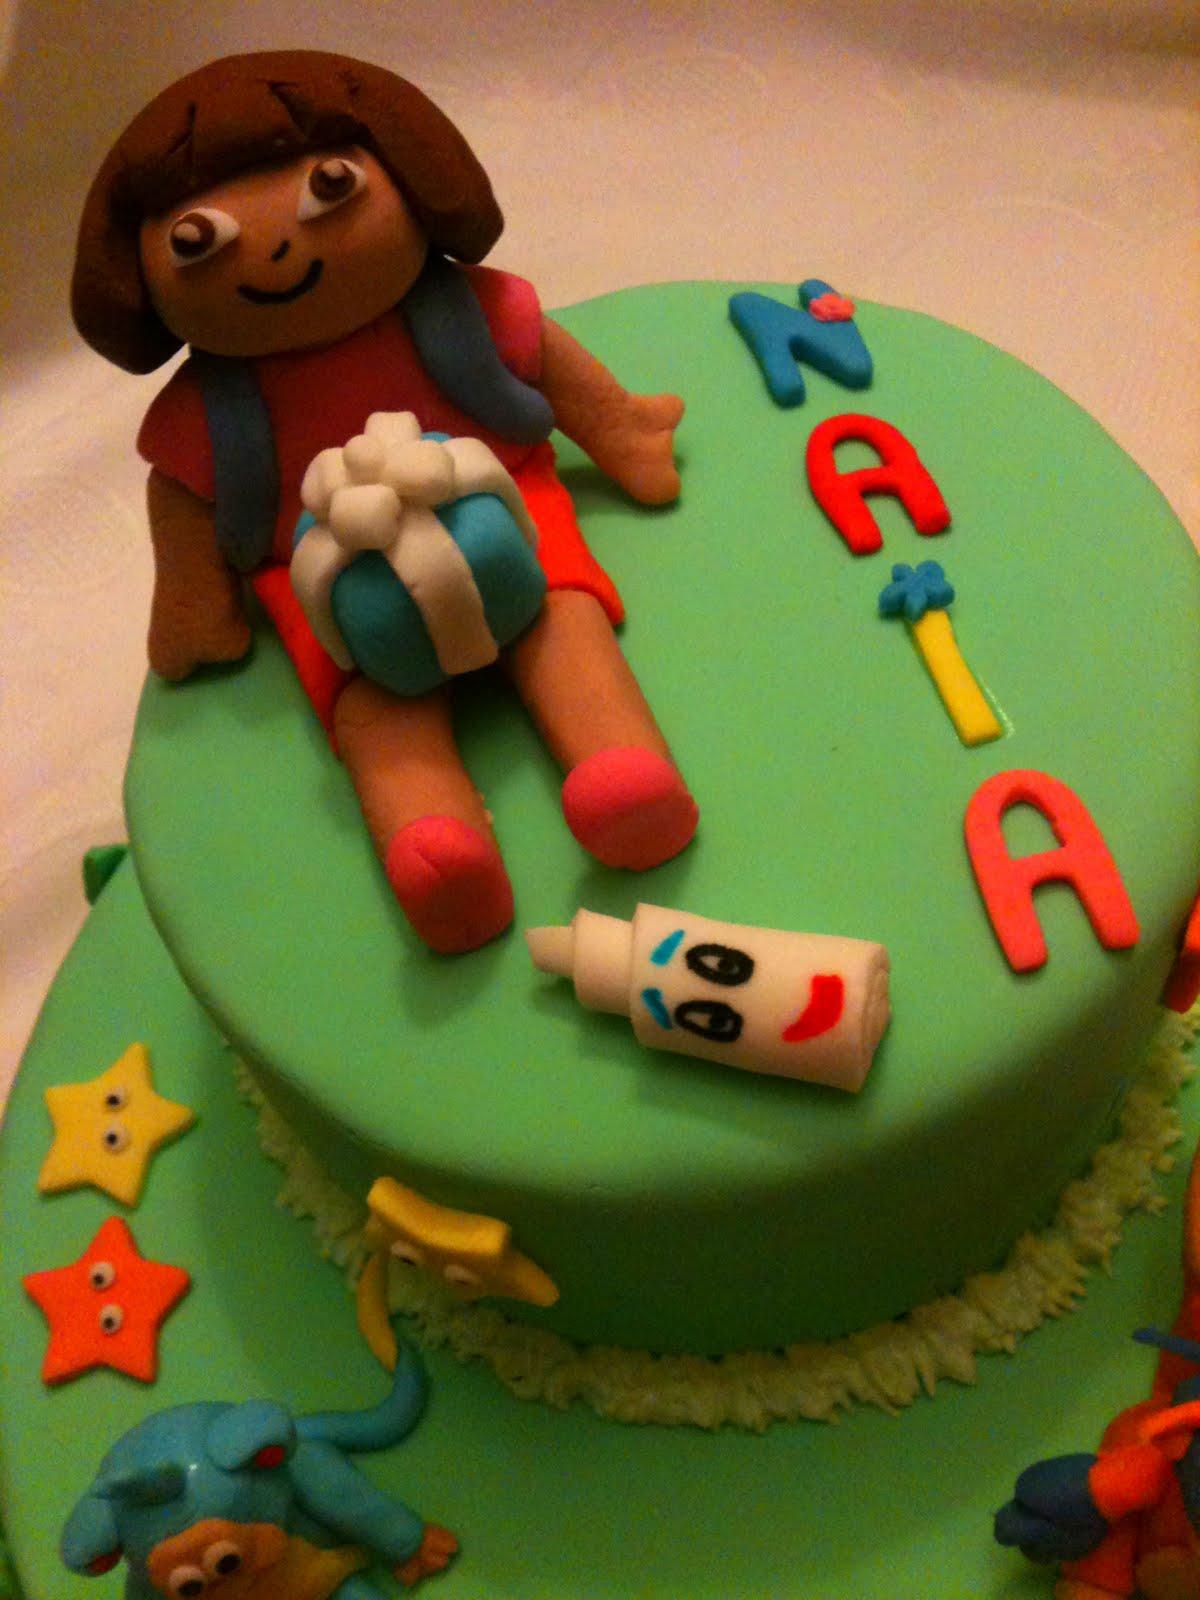 Cocina de color lila tarta dora la exploradora - Dora la exploradora cocina ...